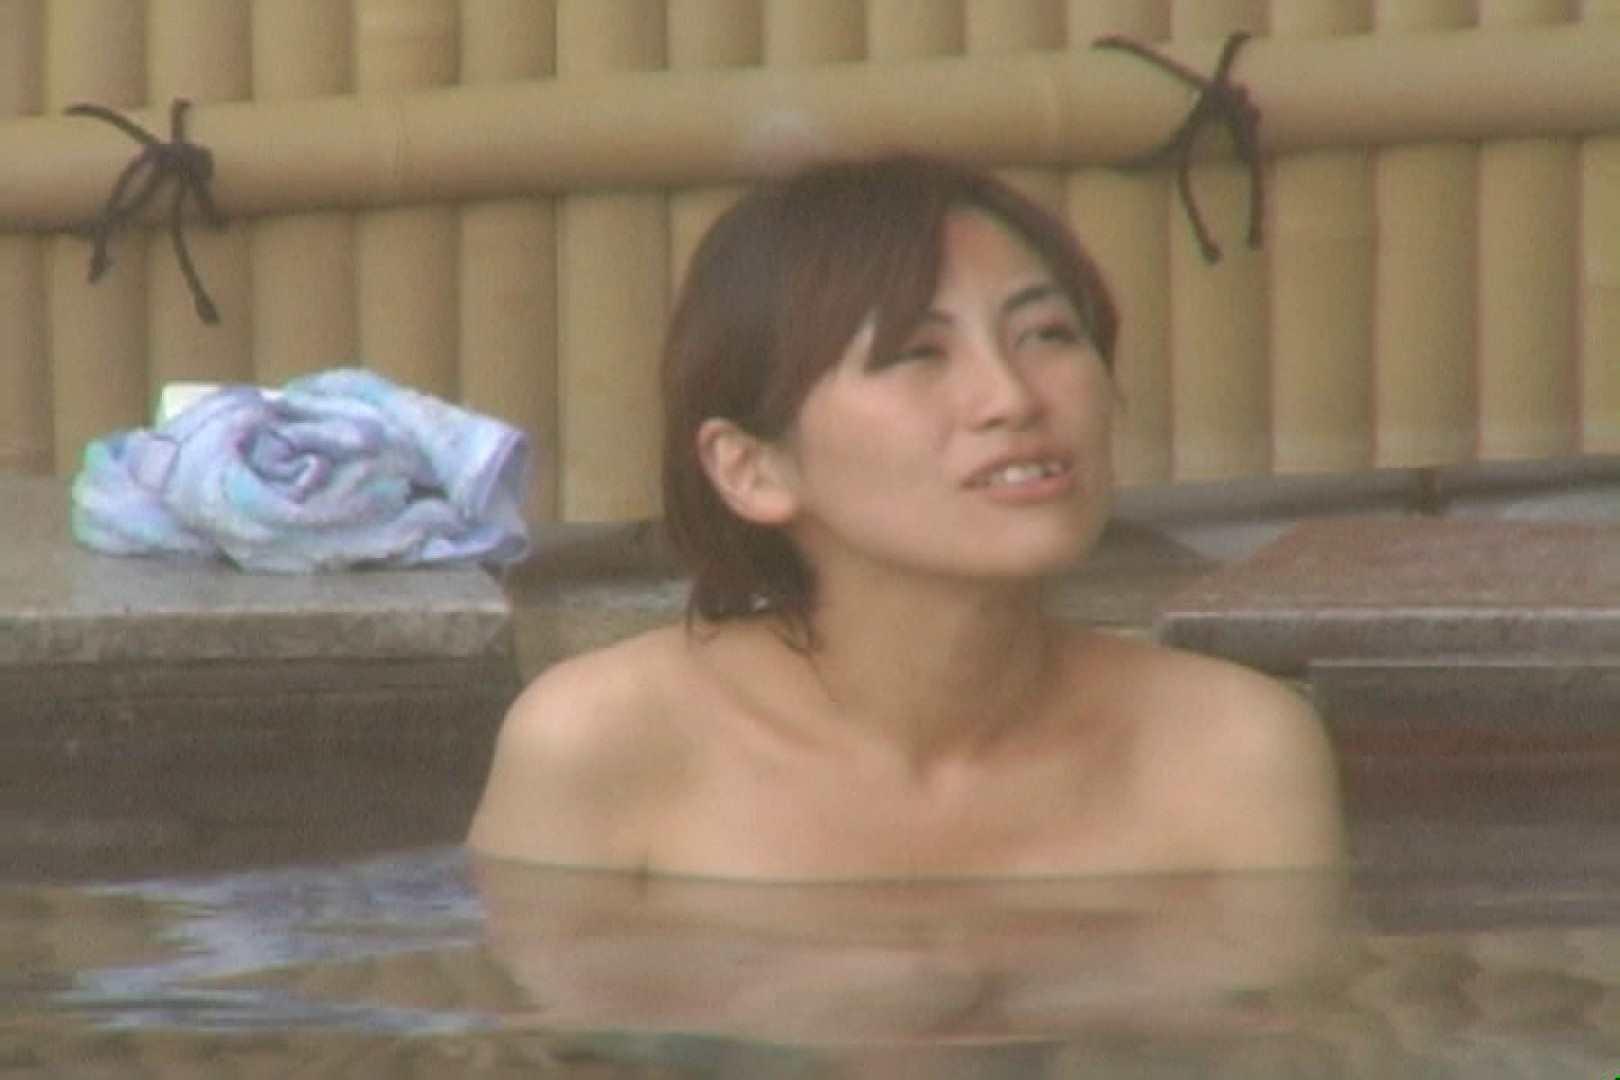 Aquaな露天風呂Vol.26【VIP】 OLセックス 盗み撮りオマンコ動画キャプチャ 59画像 17